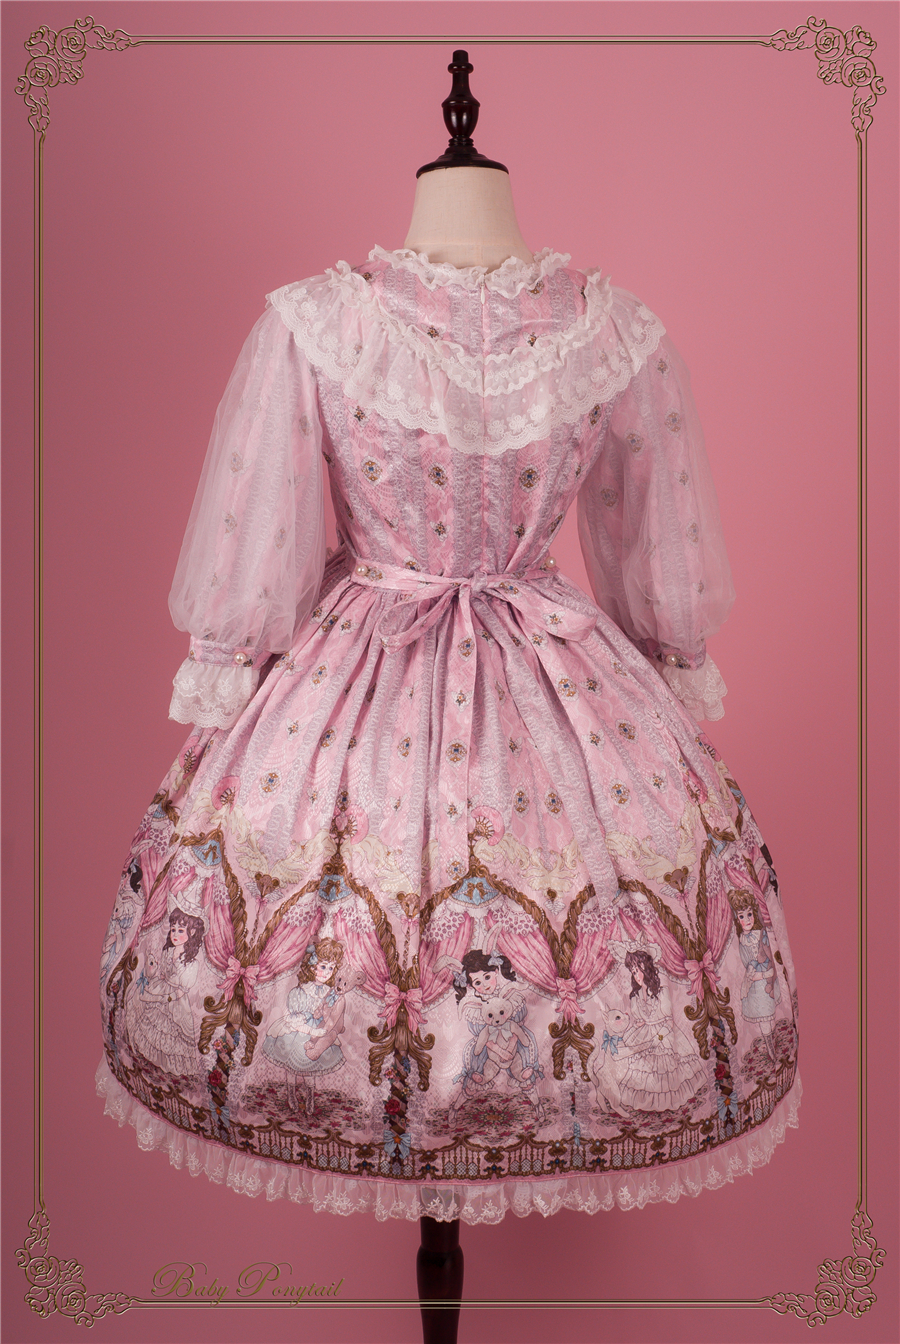 BabyPonytail_Stock Photo_My Favorite Companion_OP Pink_6.jpg